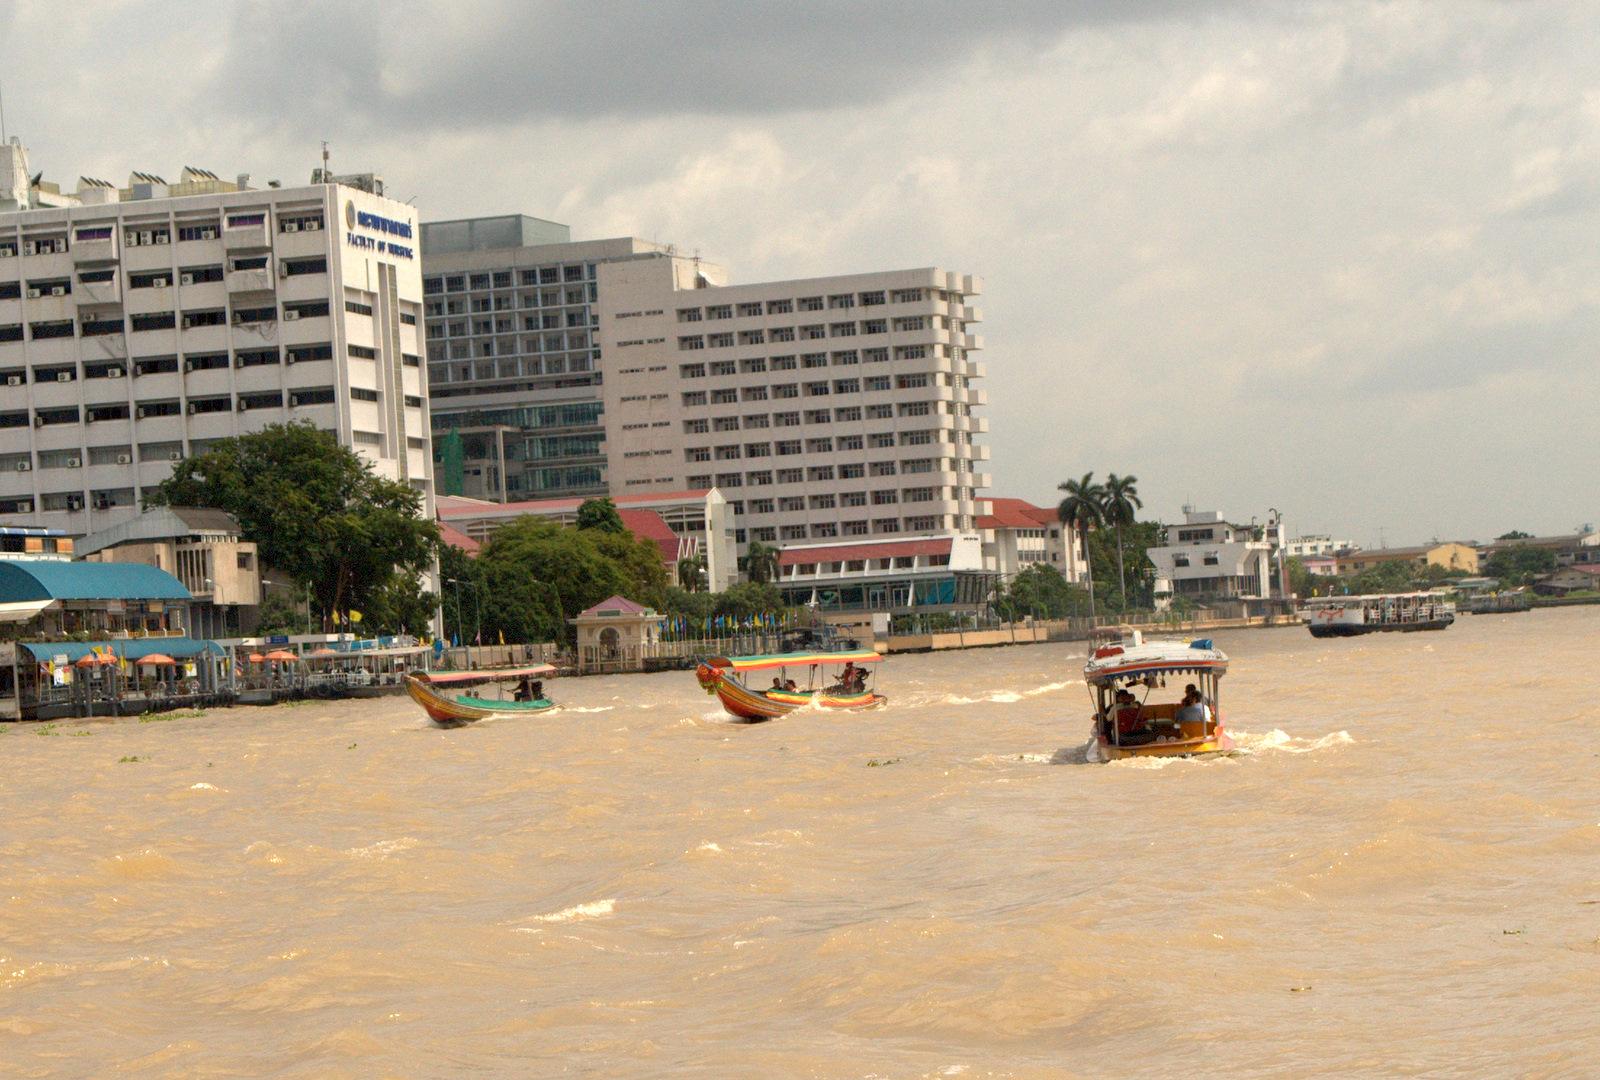 Bangkok (ostatni spacer autobusem i rzeką) 7